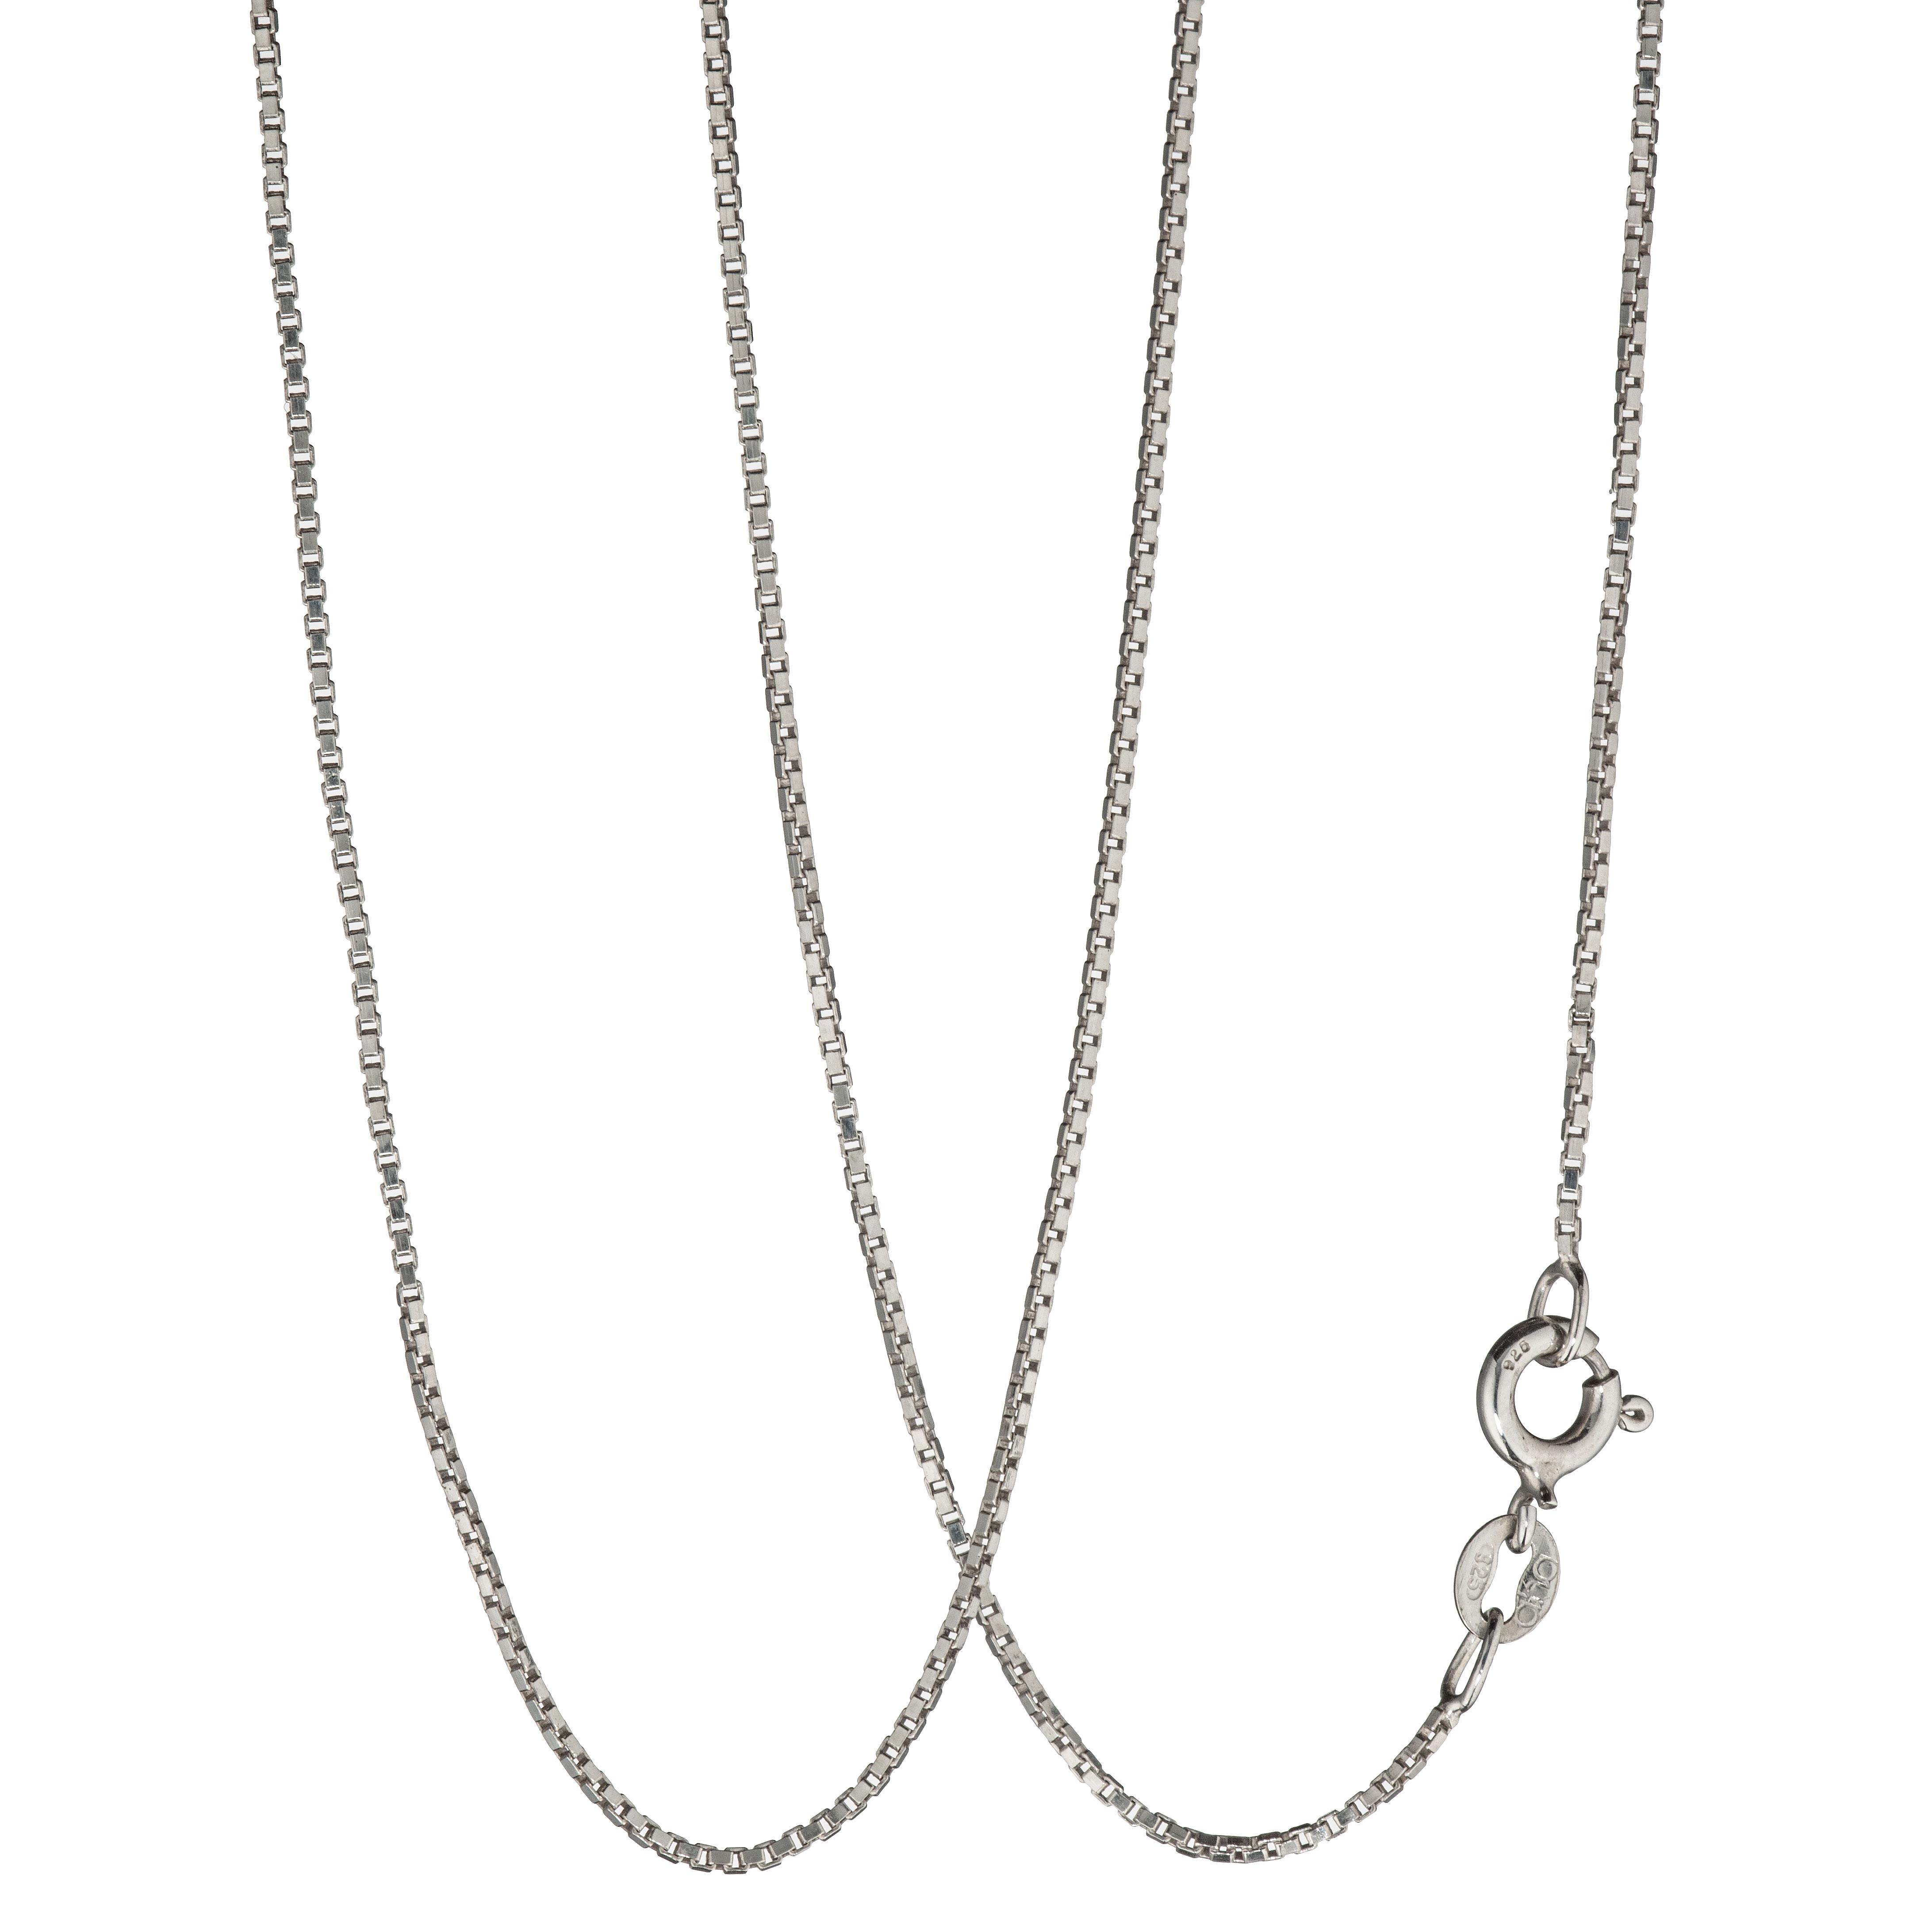 Venezia halskjede 39 cm, sterling sølv